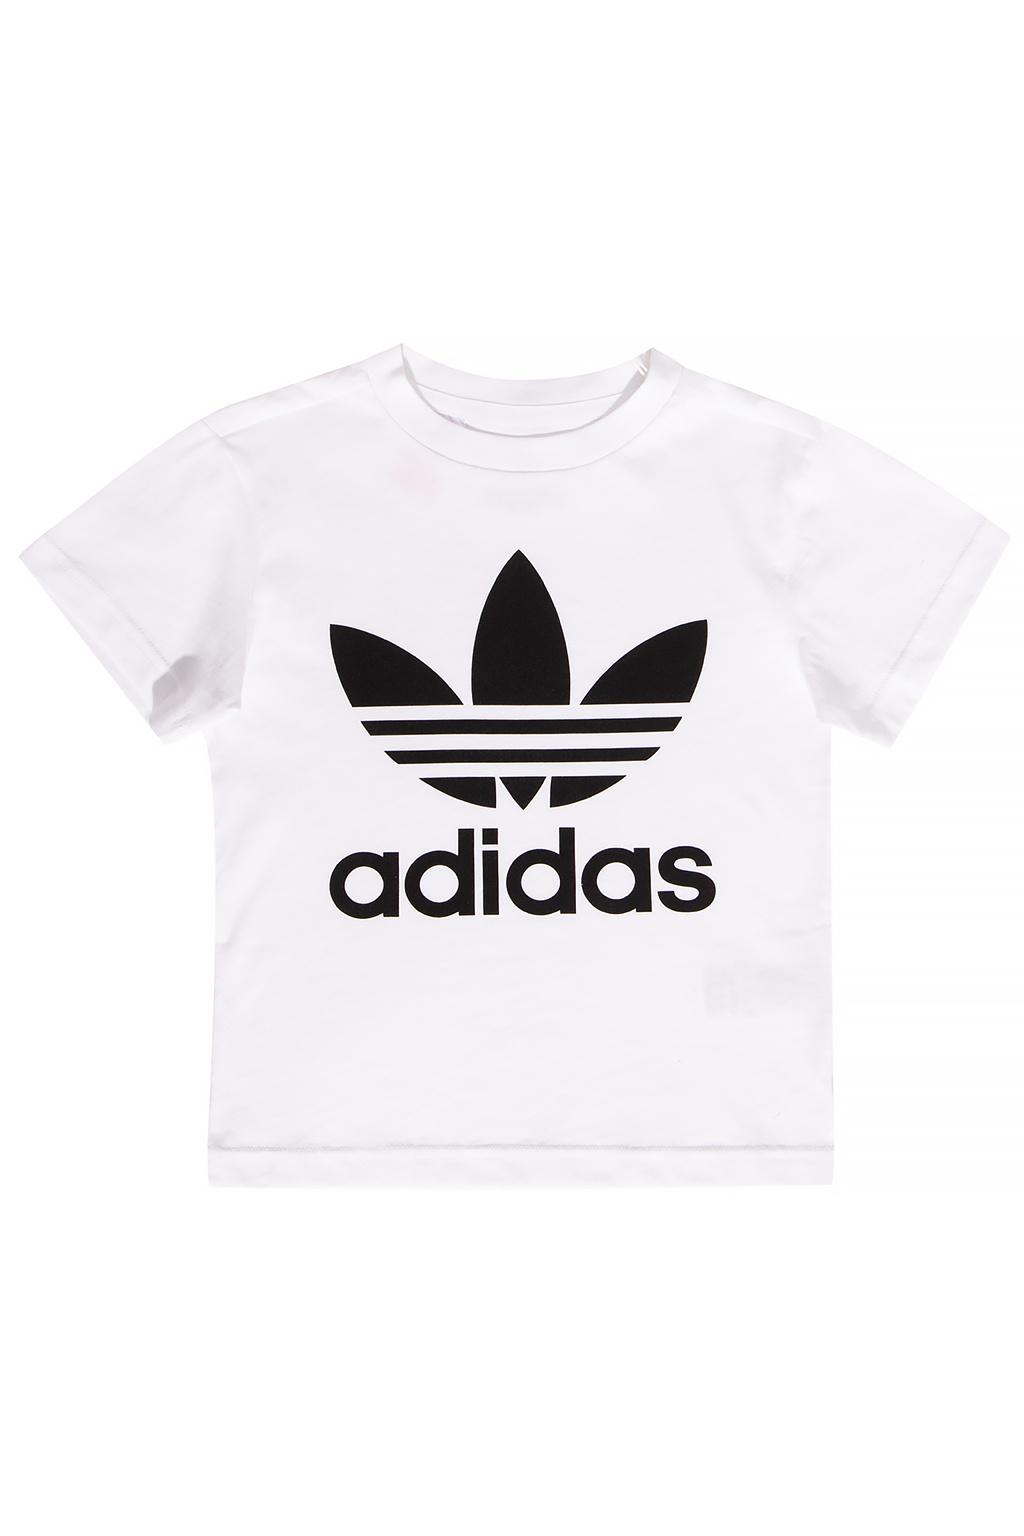 ADIDAS Kids T-shirt with logo